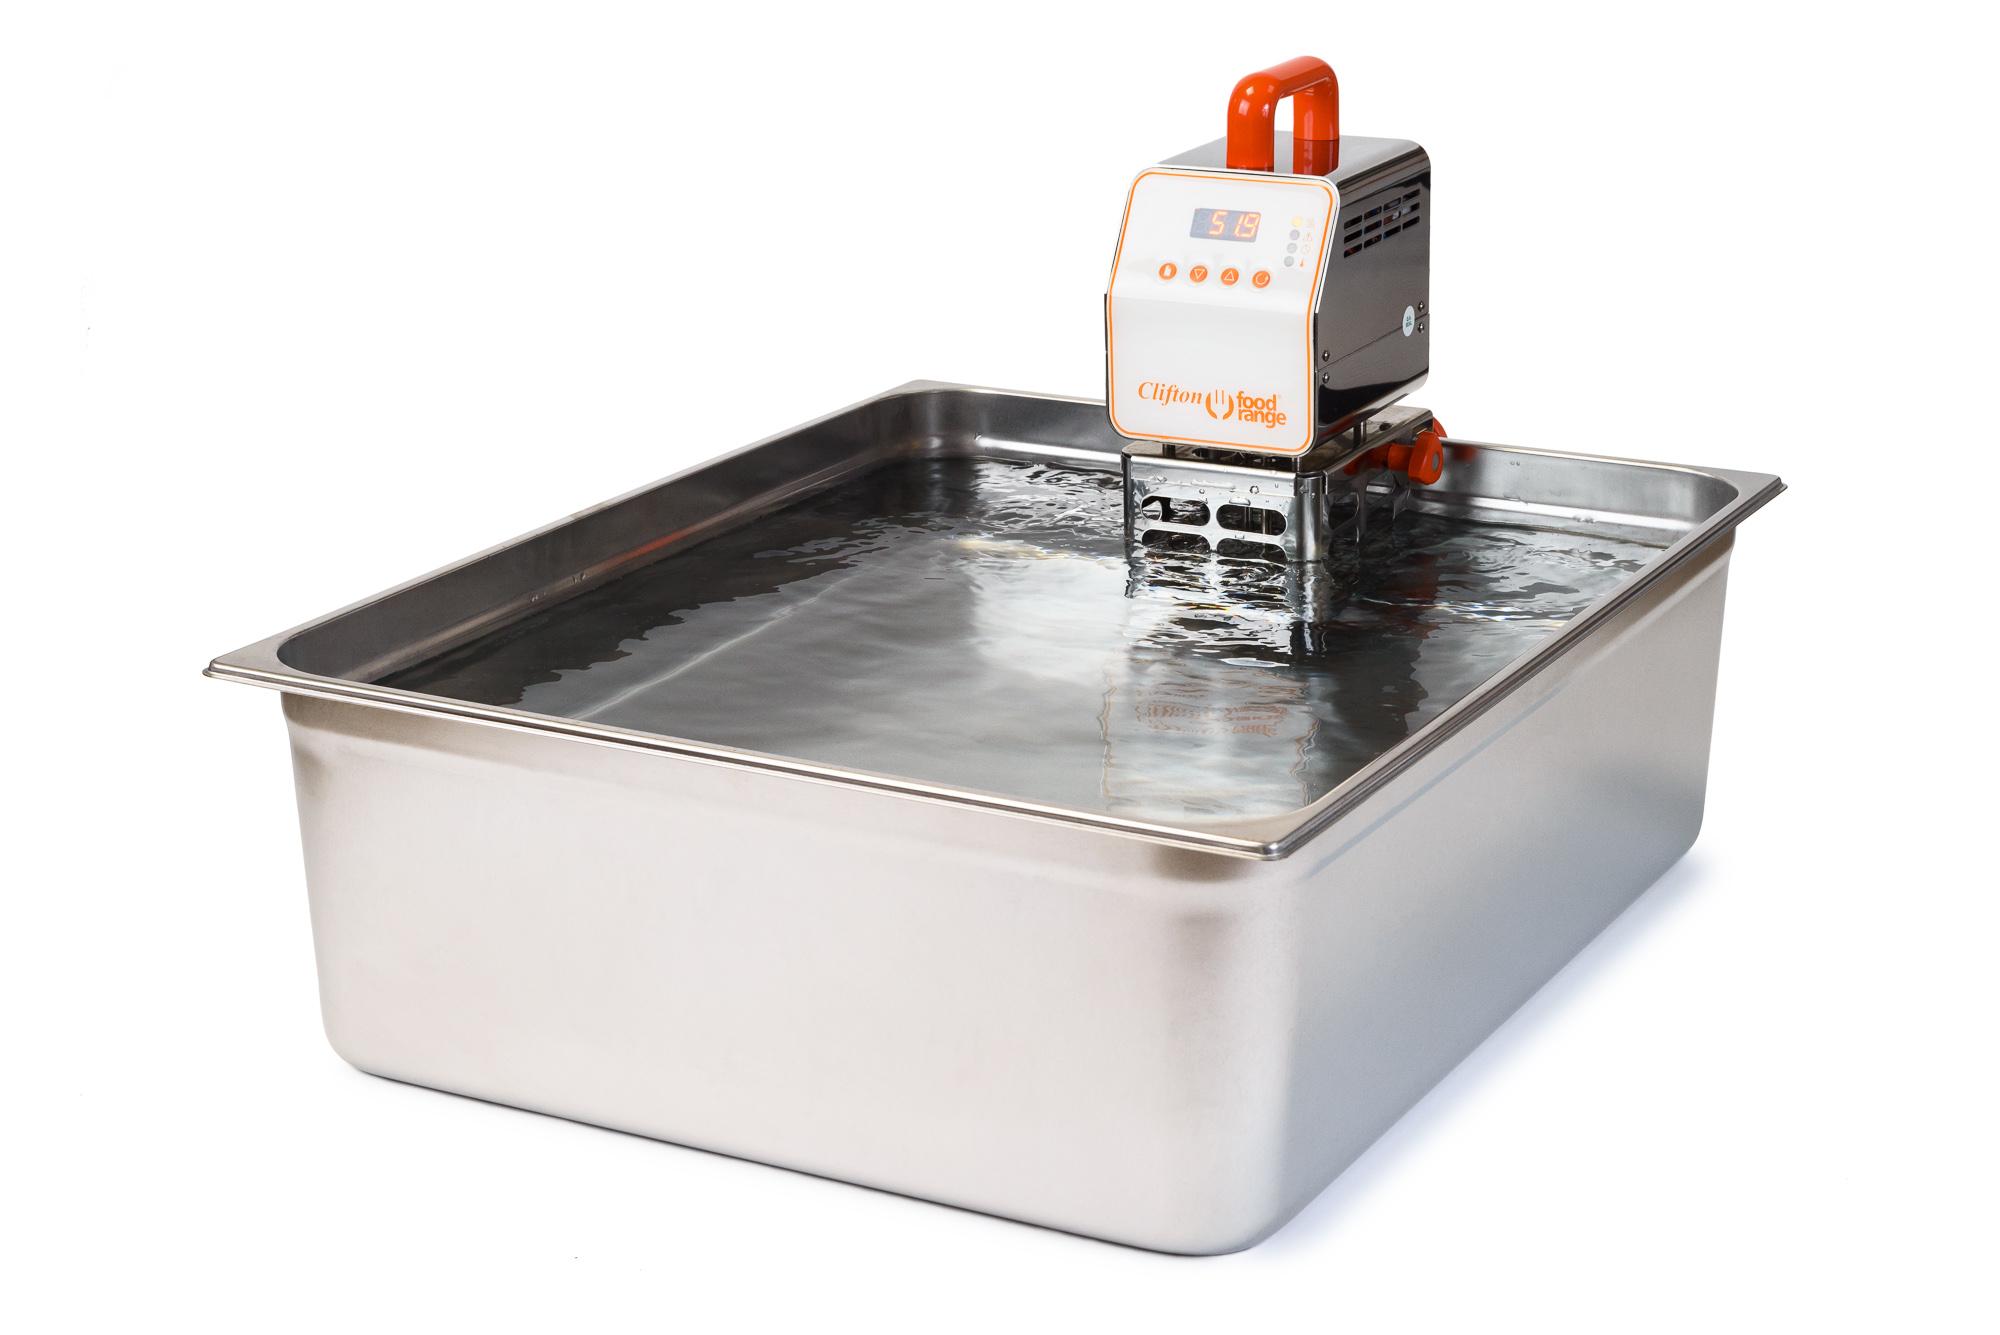 Waterbath product